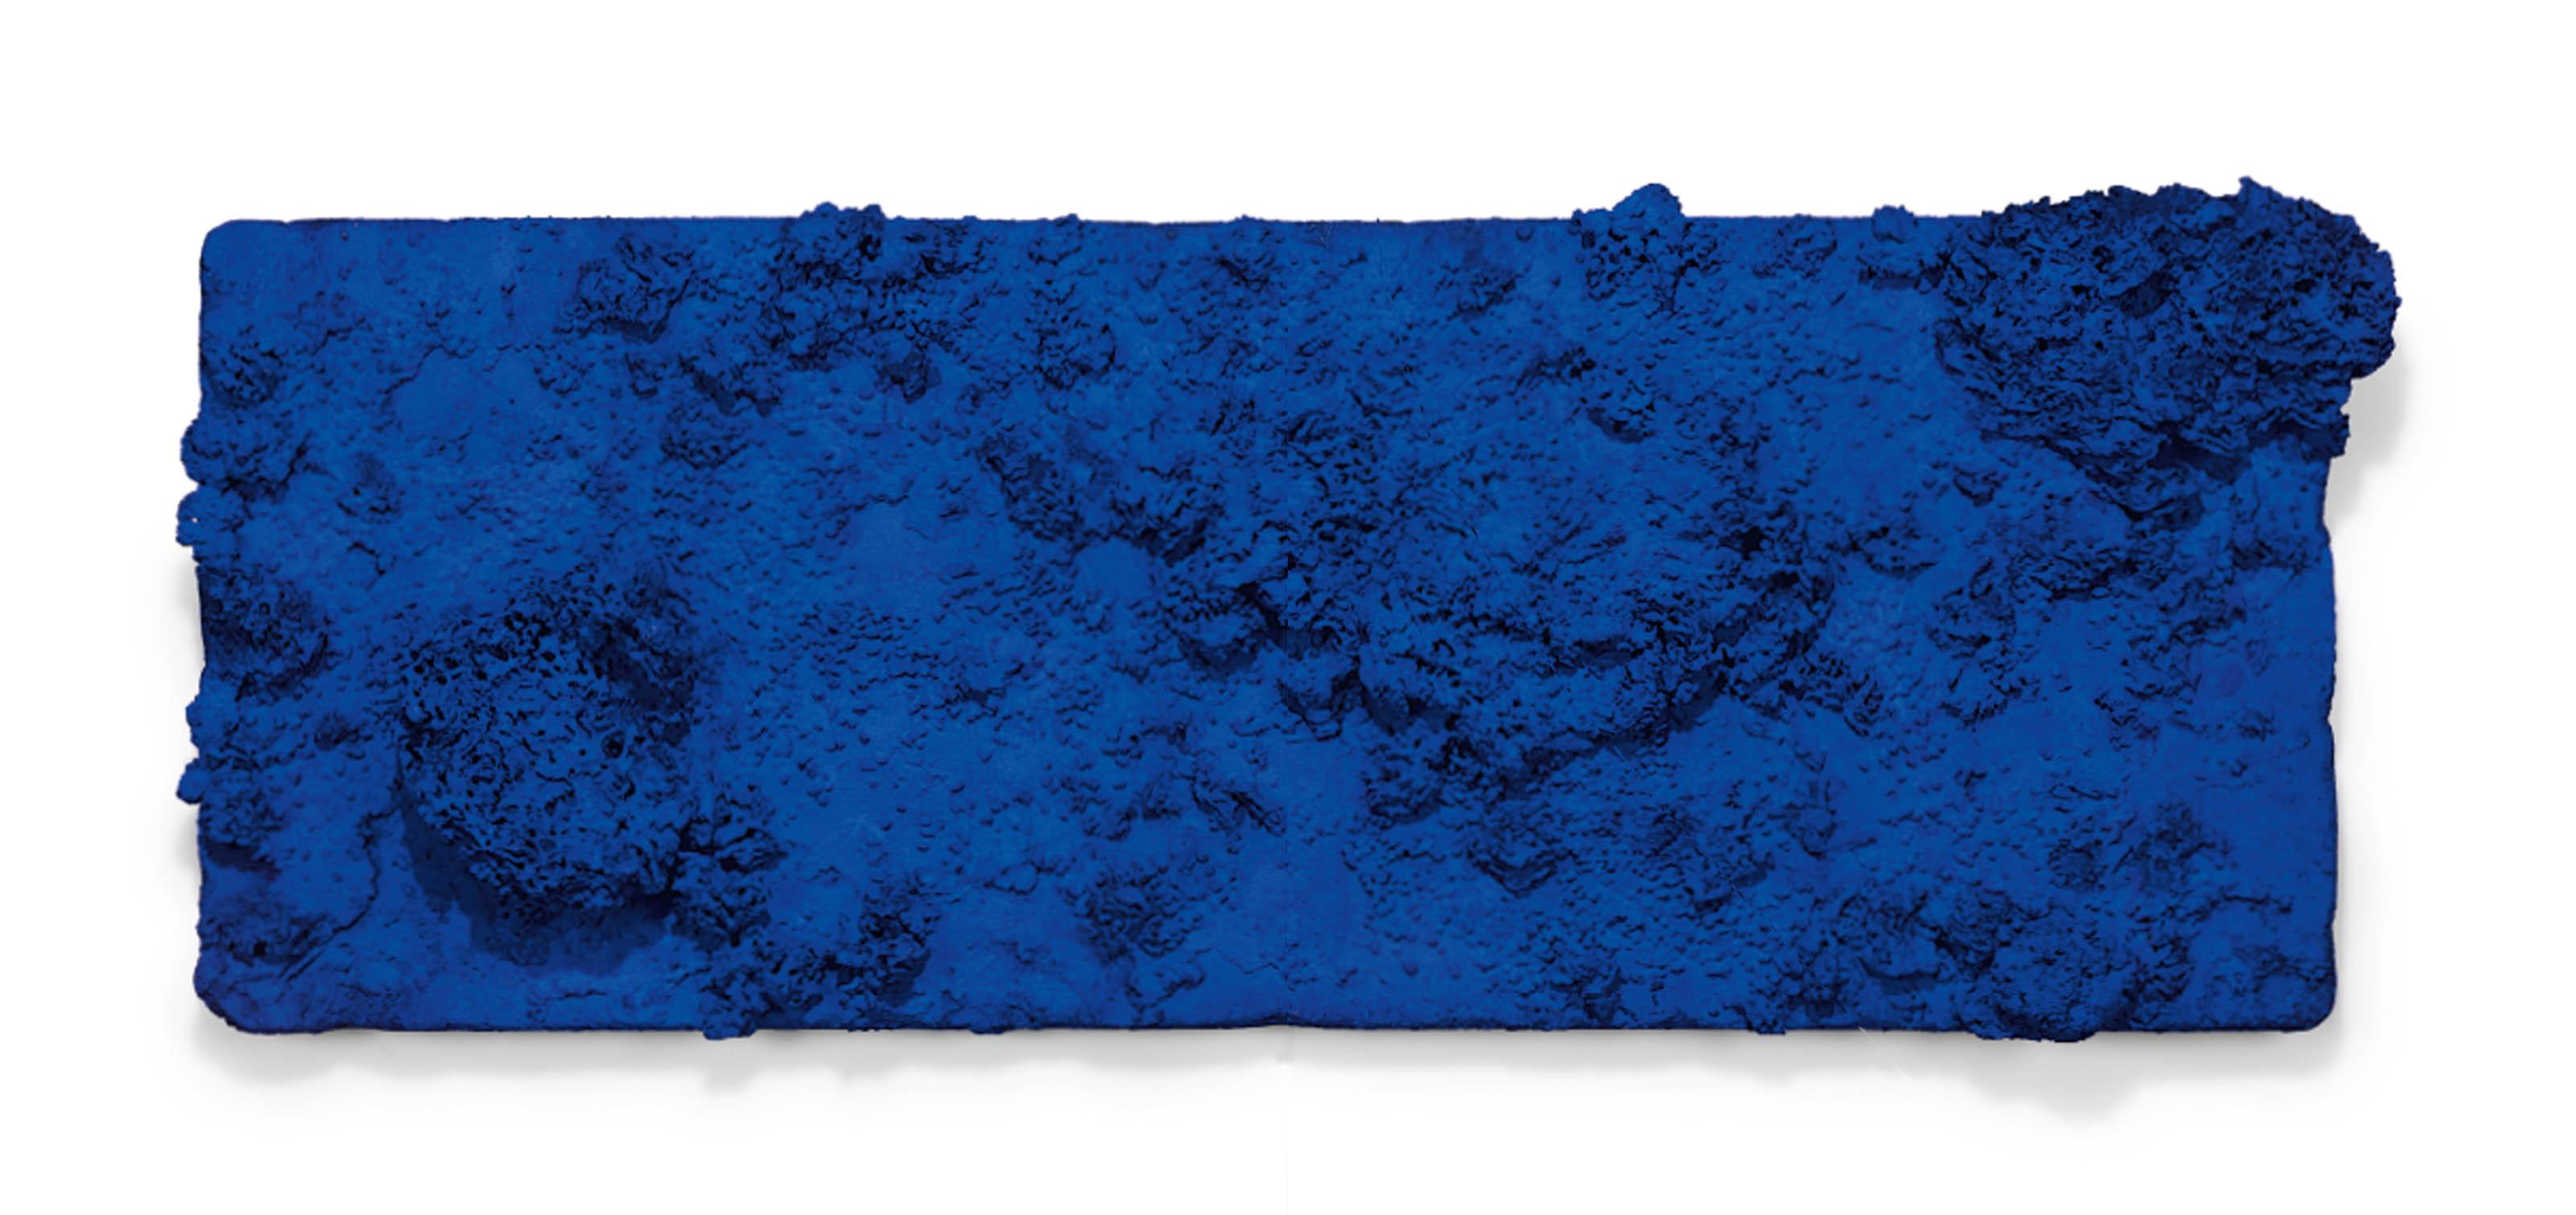 Accord Bleu (Sponge Relief)